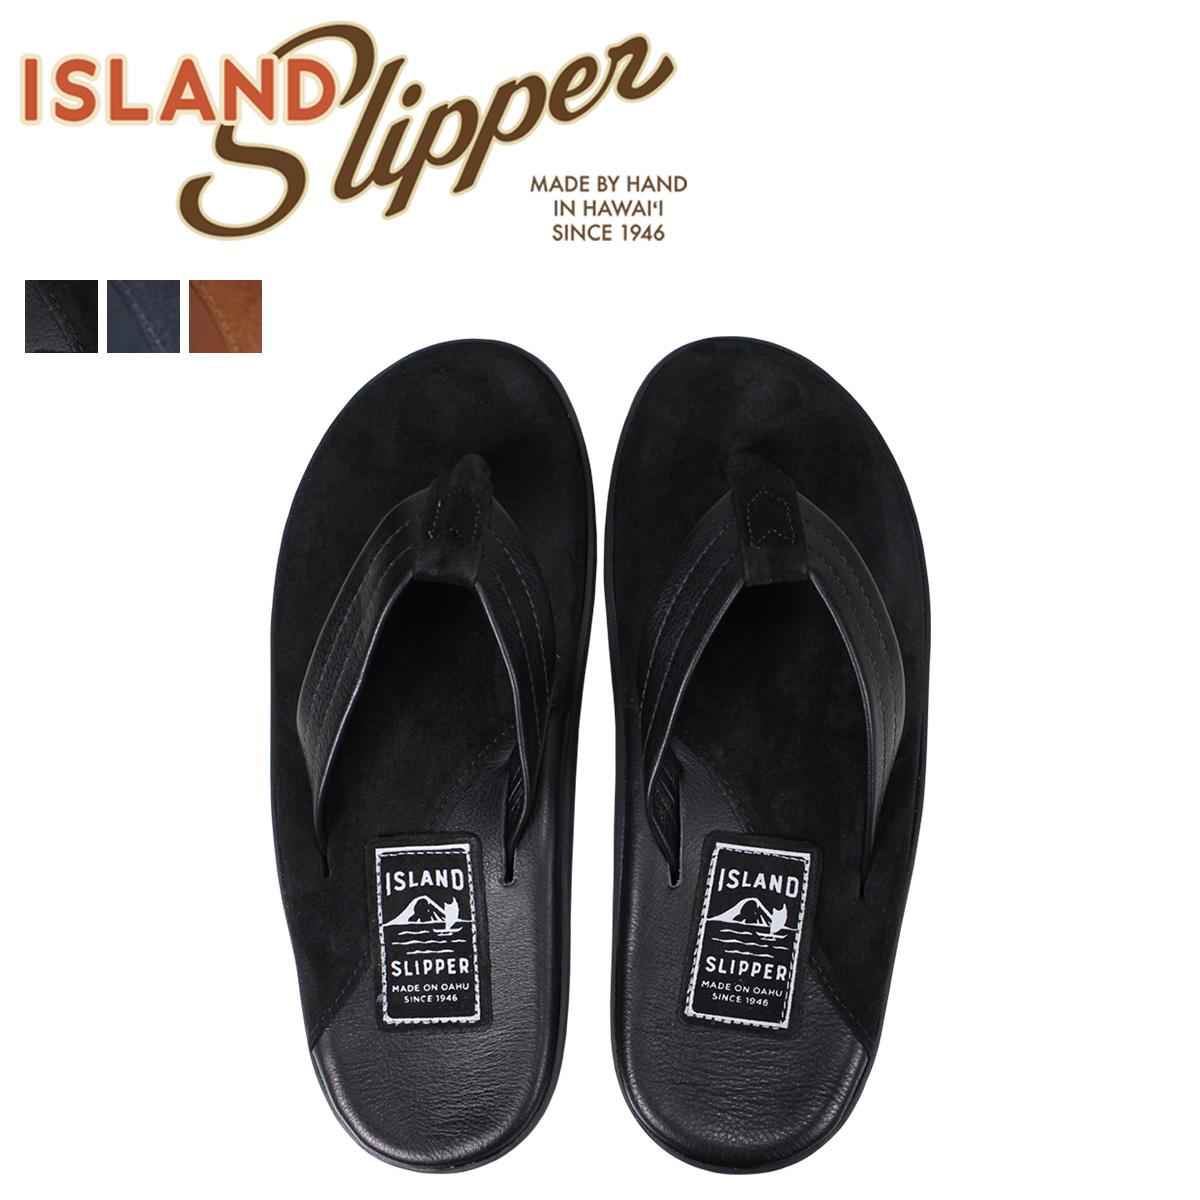 ISLAND SLIPPER アイランドスリッパ サンダル トングサンダル メンズ スエード レザー LEATHER SUEDE PB205 PT205 [4/5 追加入荷]